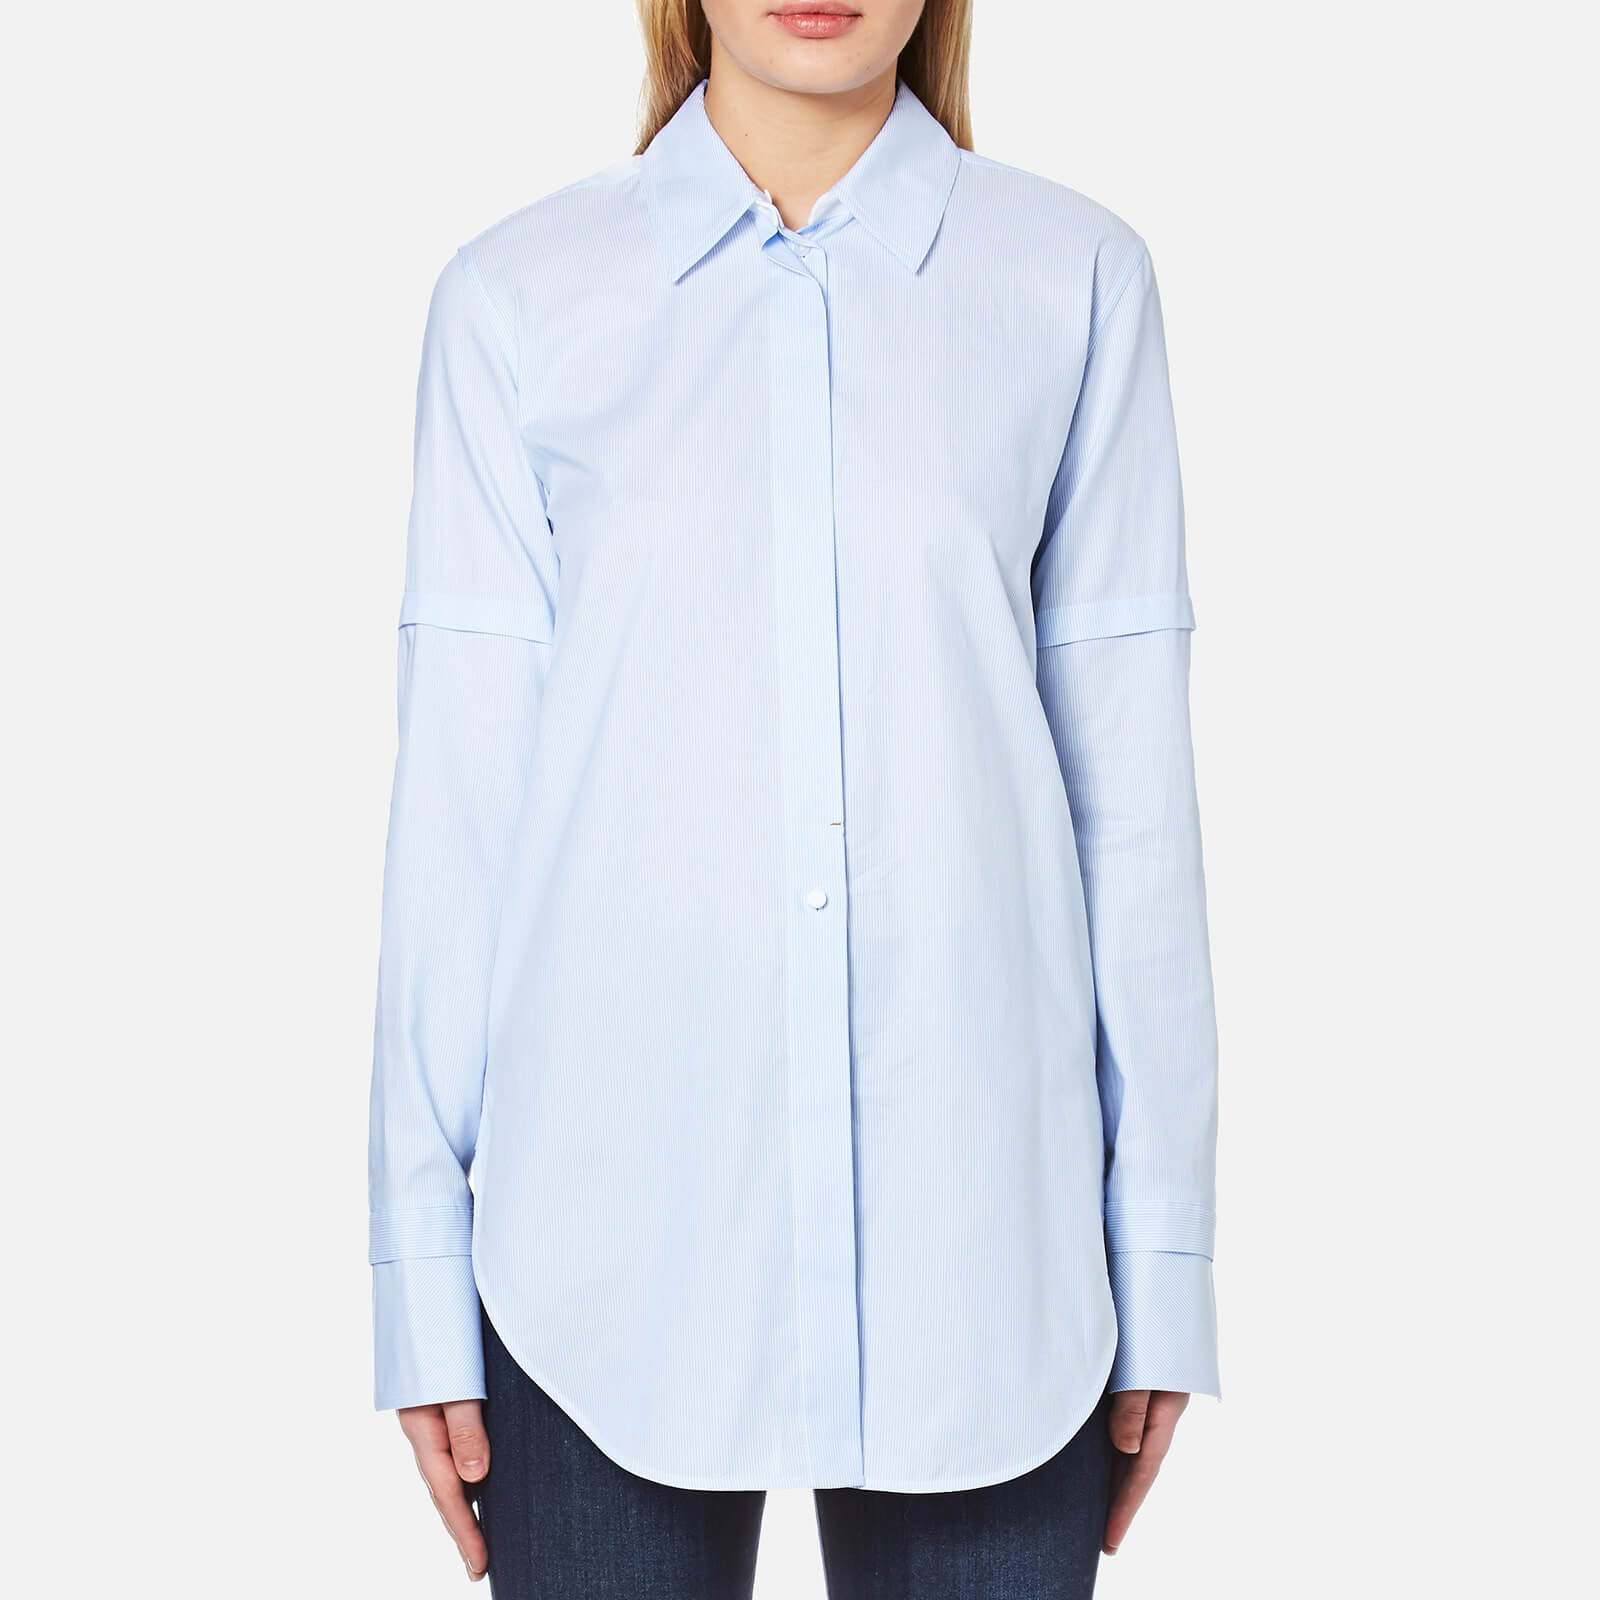 unique style discount collection top-rated fashion Helmut Lang Women's Tuxedo Shirt - Light Blue